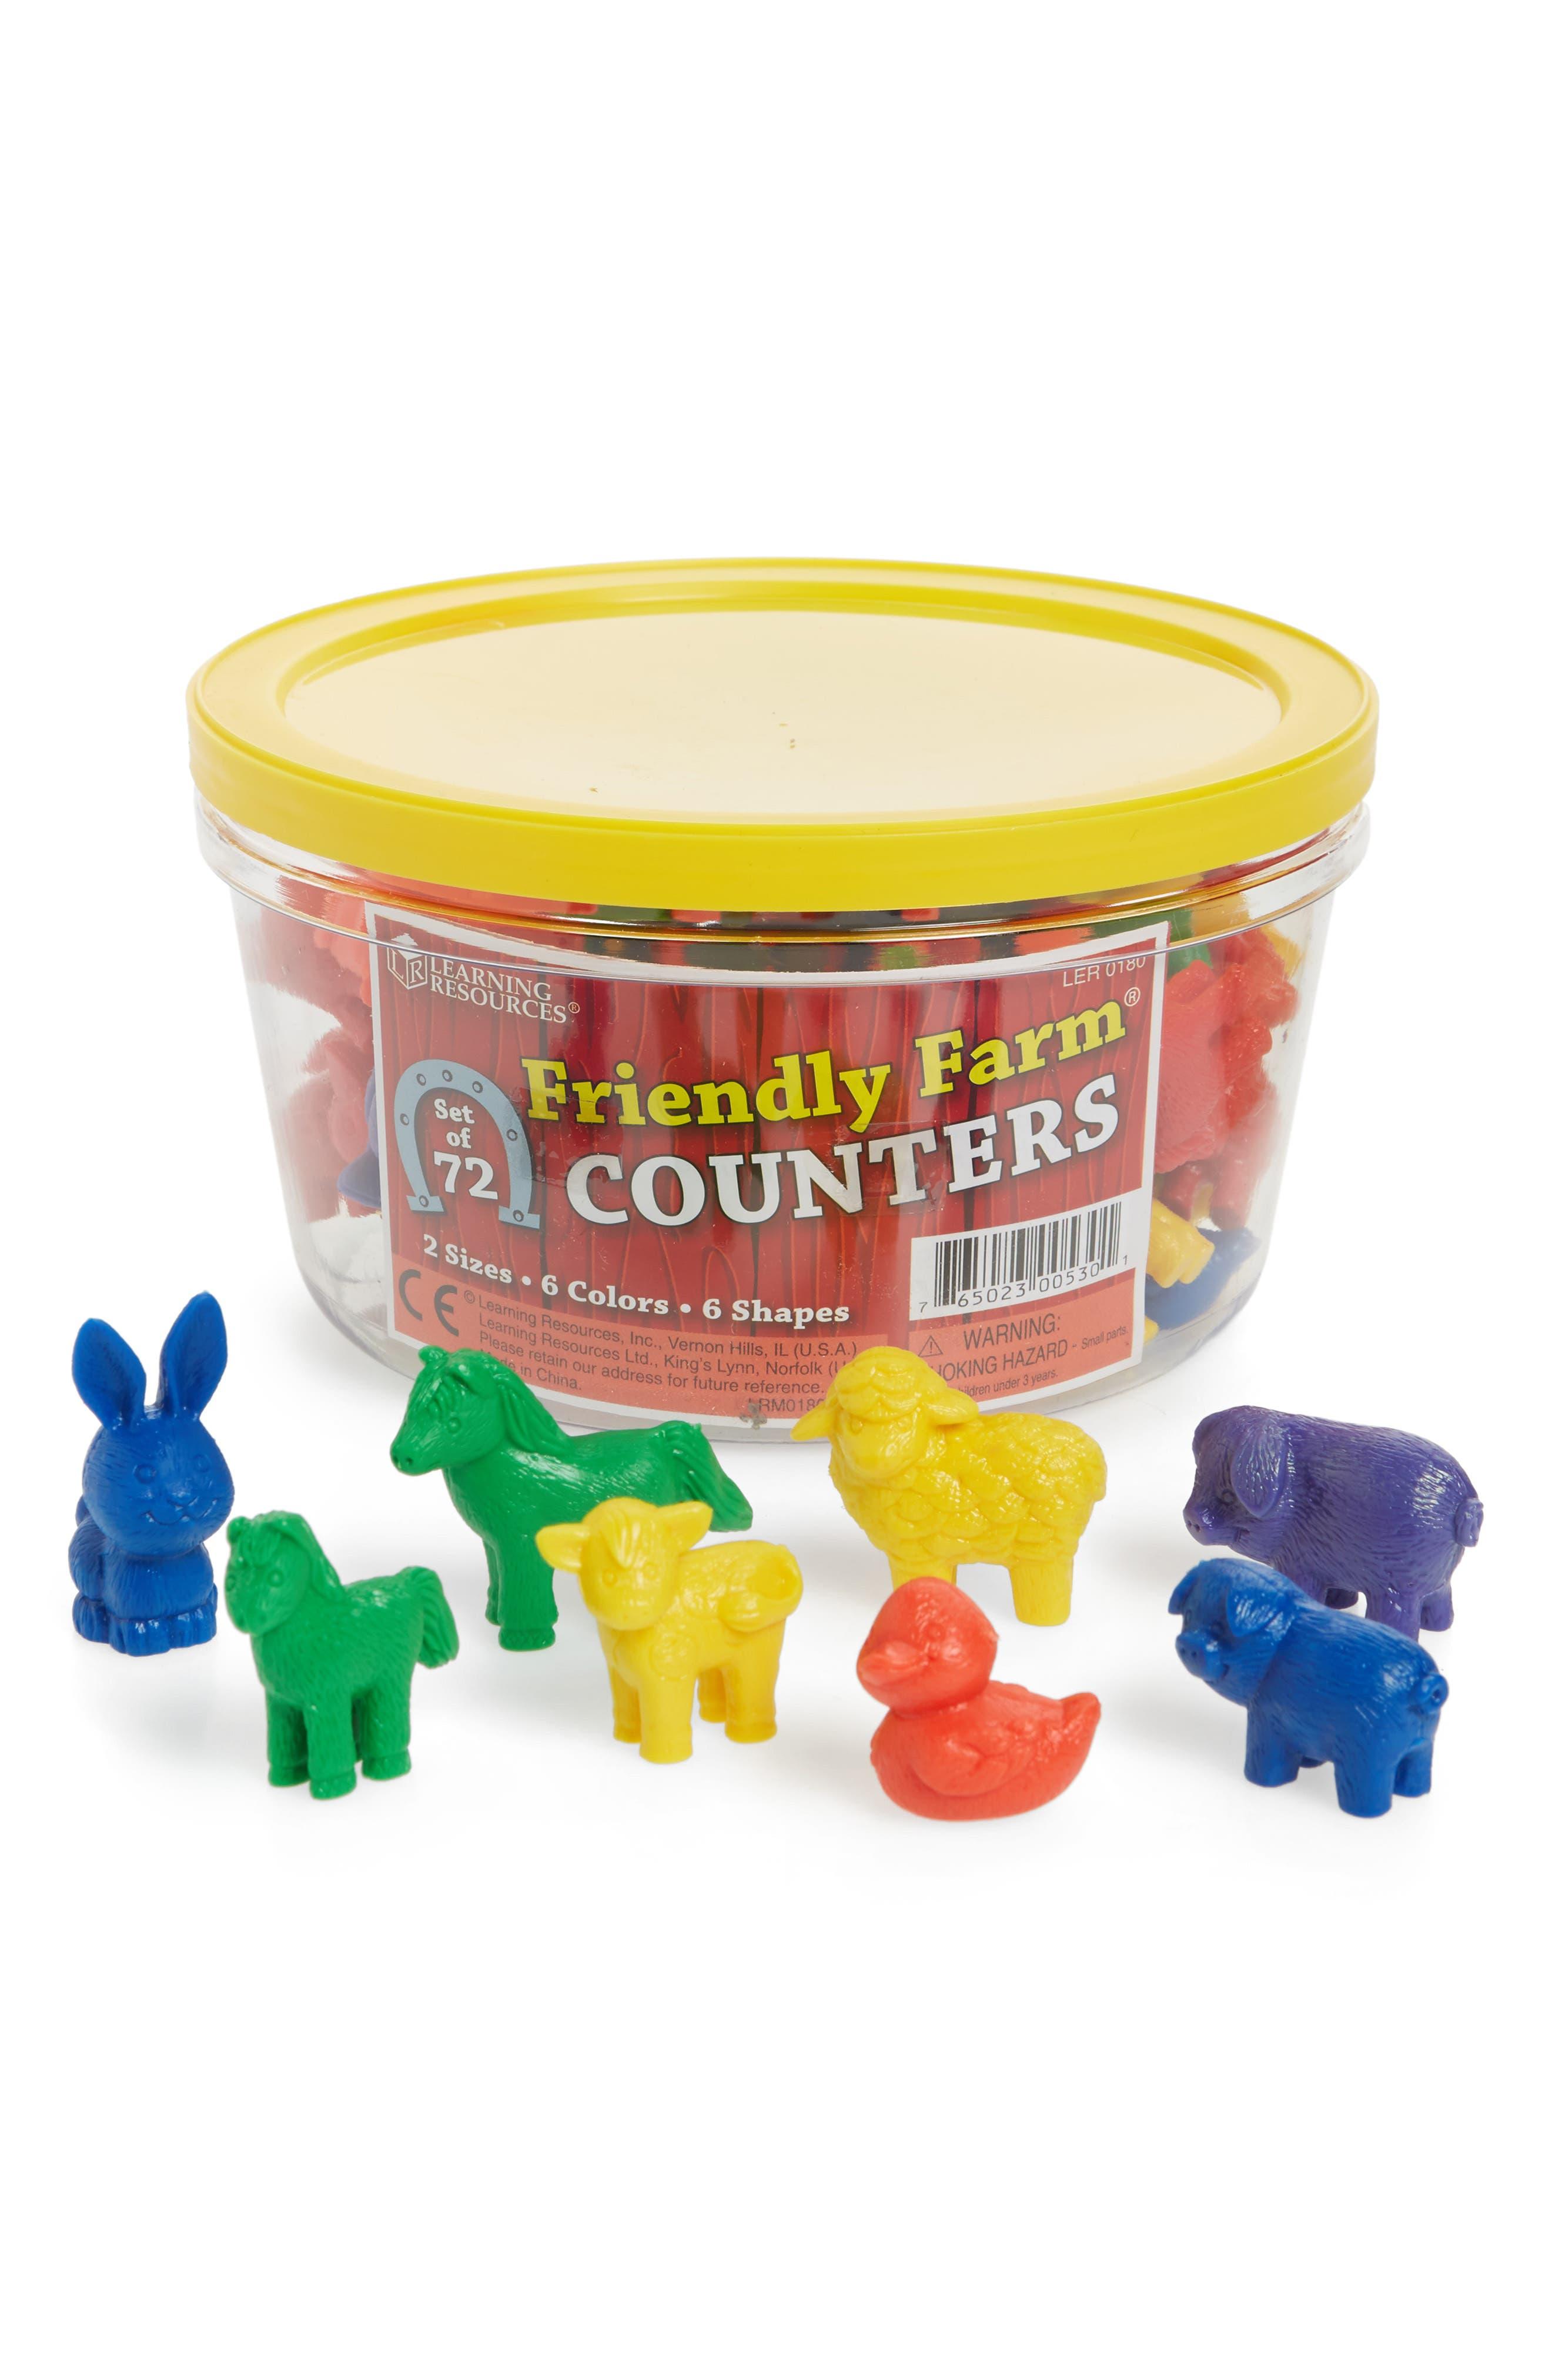 72-Piece Friendly Farm Counters Play Set,                             Main thumbnail 1, color,                             Brown